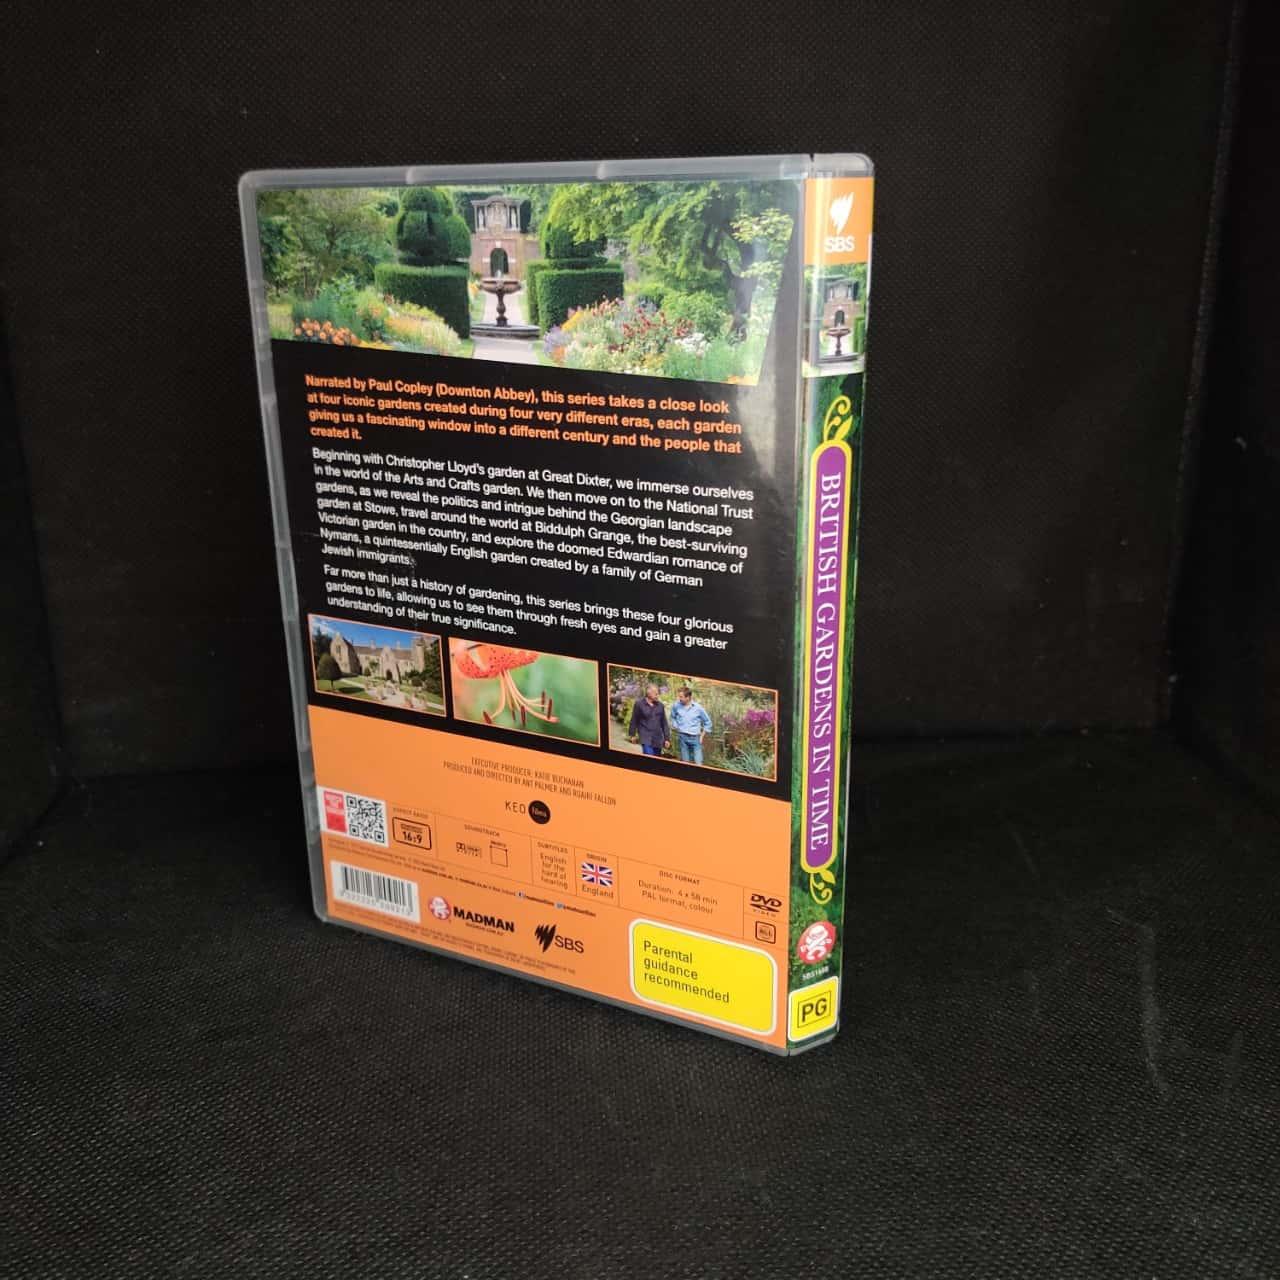 5 Assorted Gardening DVD's - ABC, SBS, Gardening Australia, Vasili, Alan Titmarch